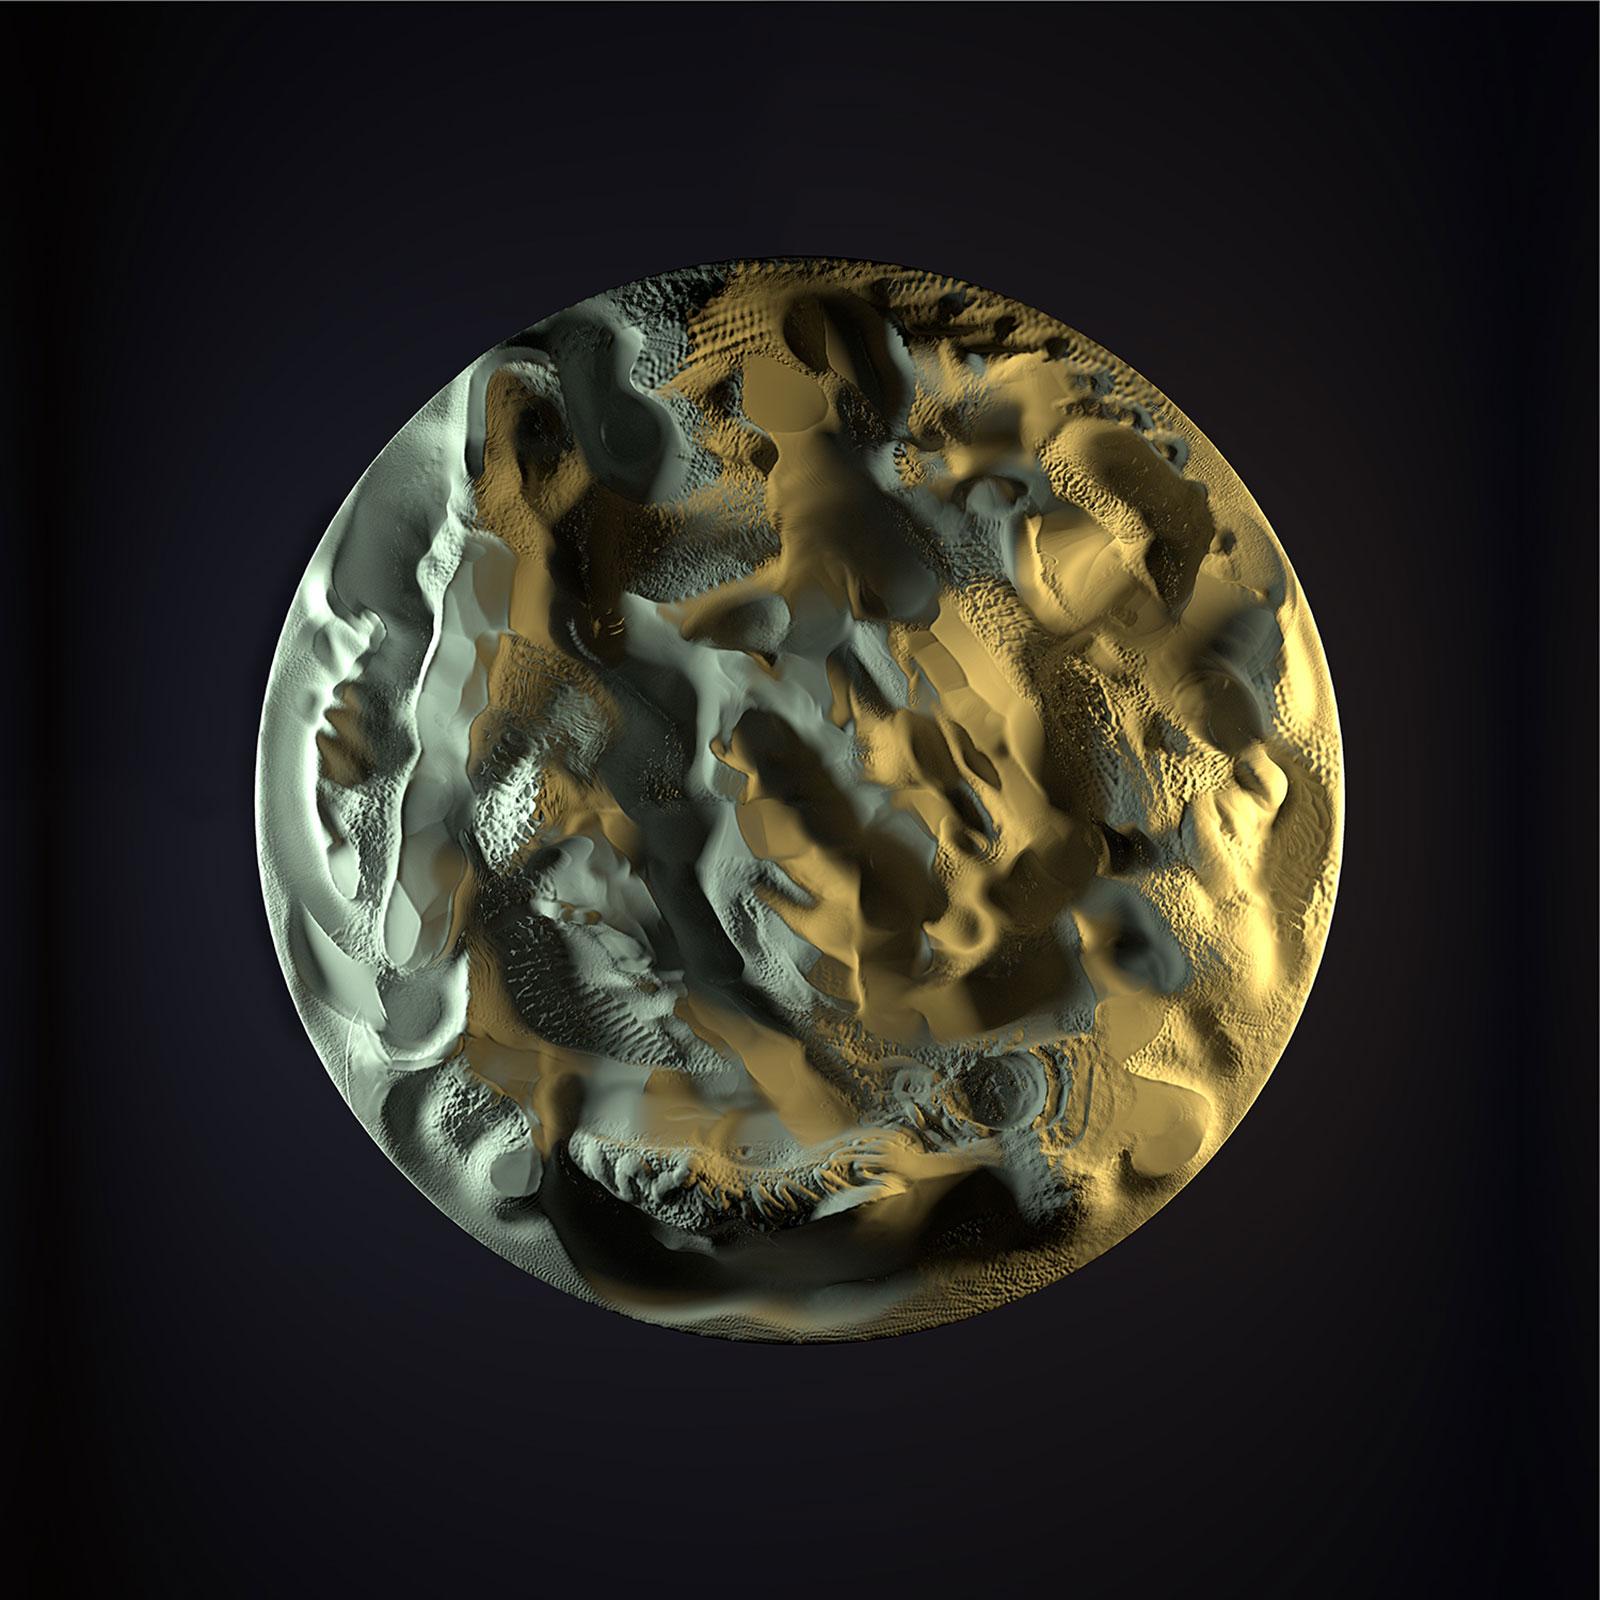 Surface I 04, CGI Fine Art Print, 110 x 110 cm, 2012